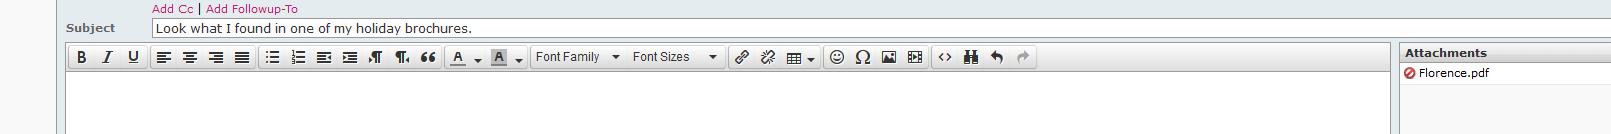 Fixed: Webmail not sending attachments - Plusnet Community